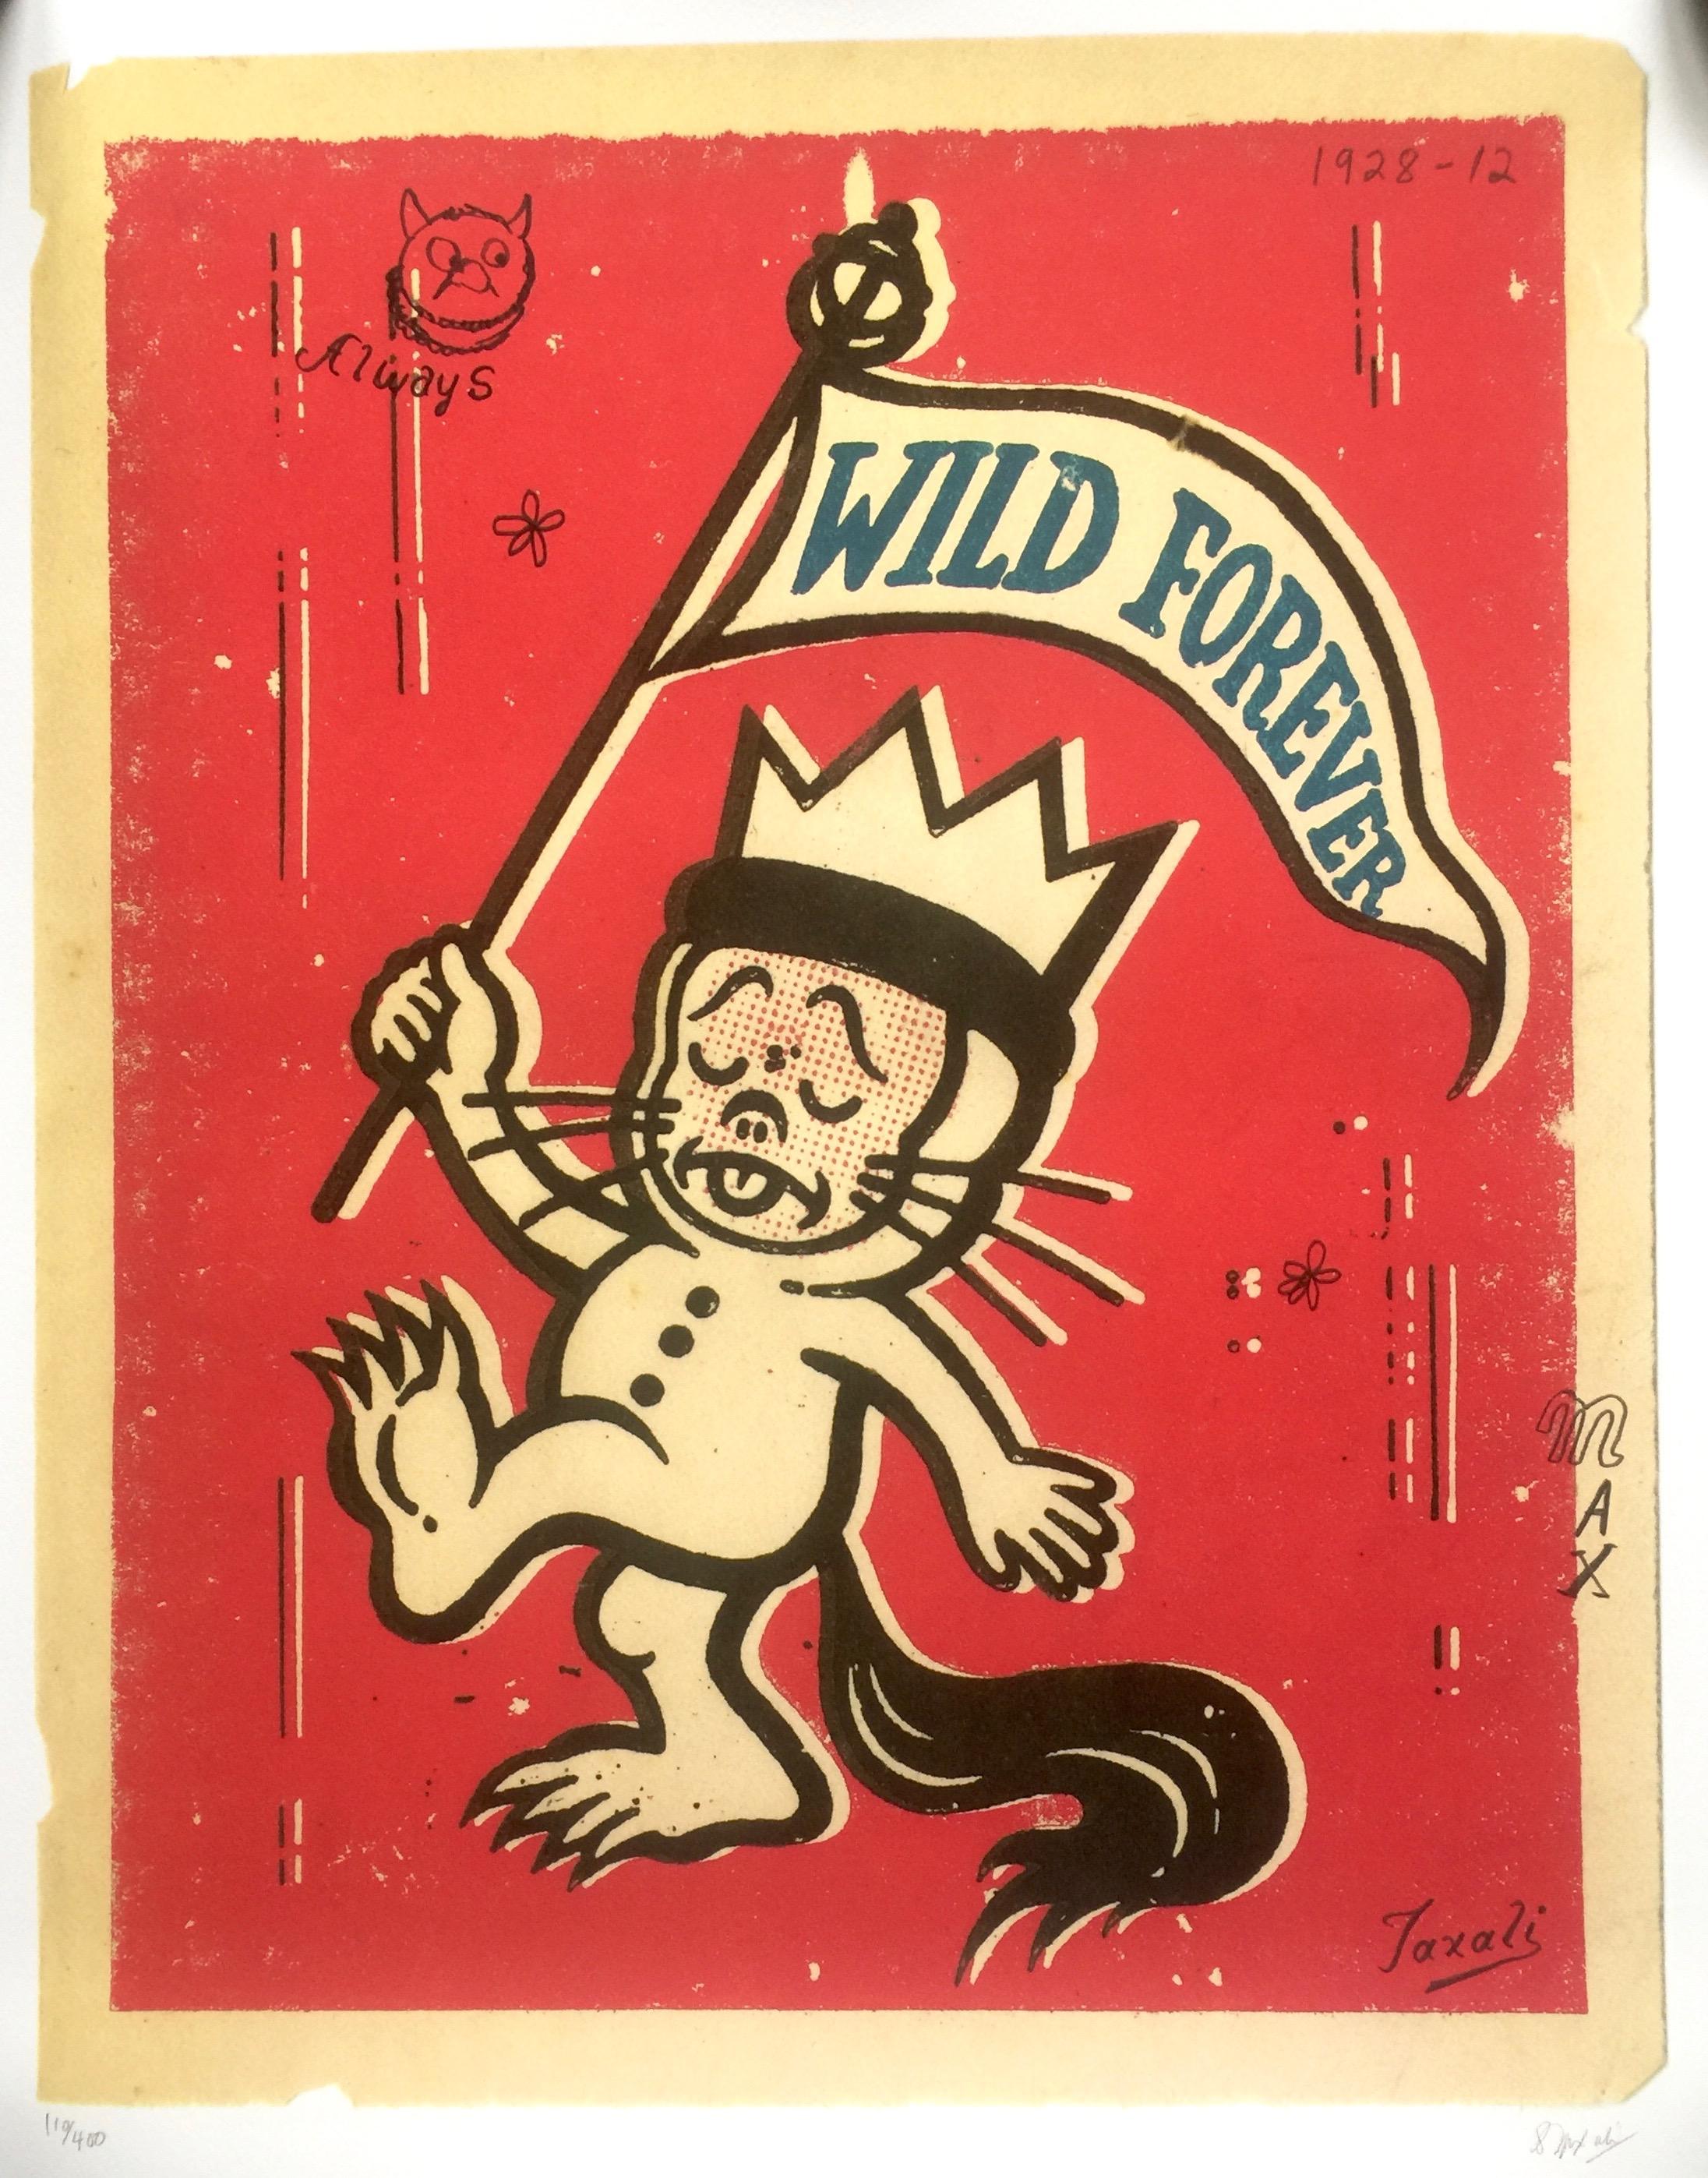 Wild Forever - Gary Taxali